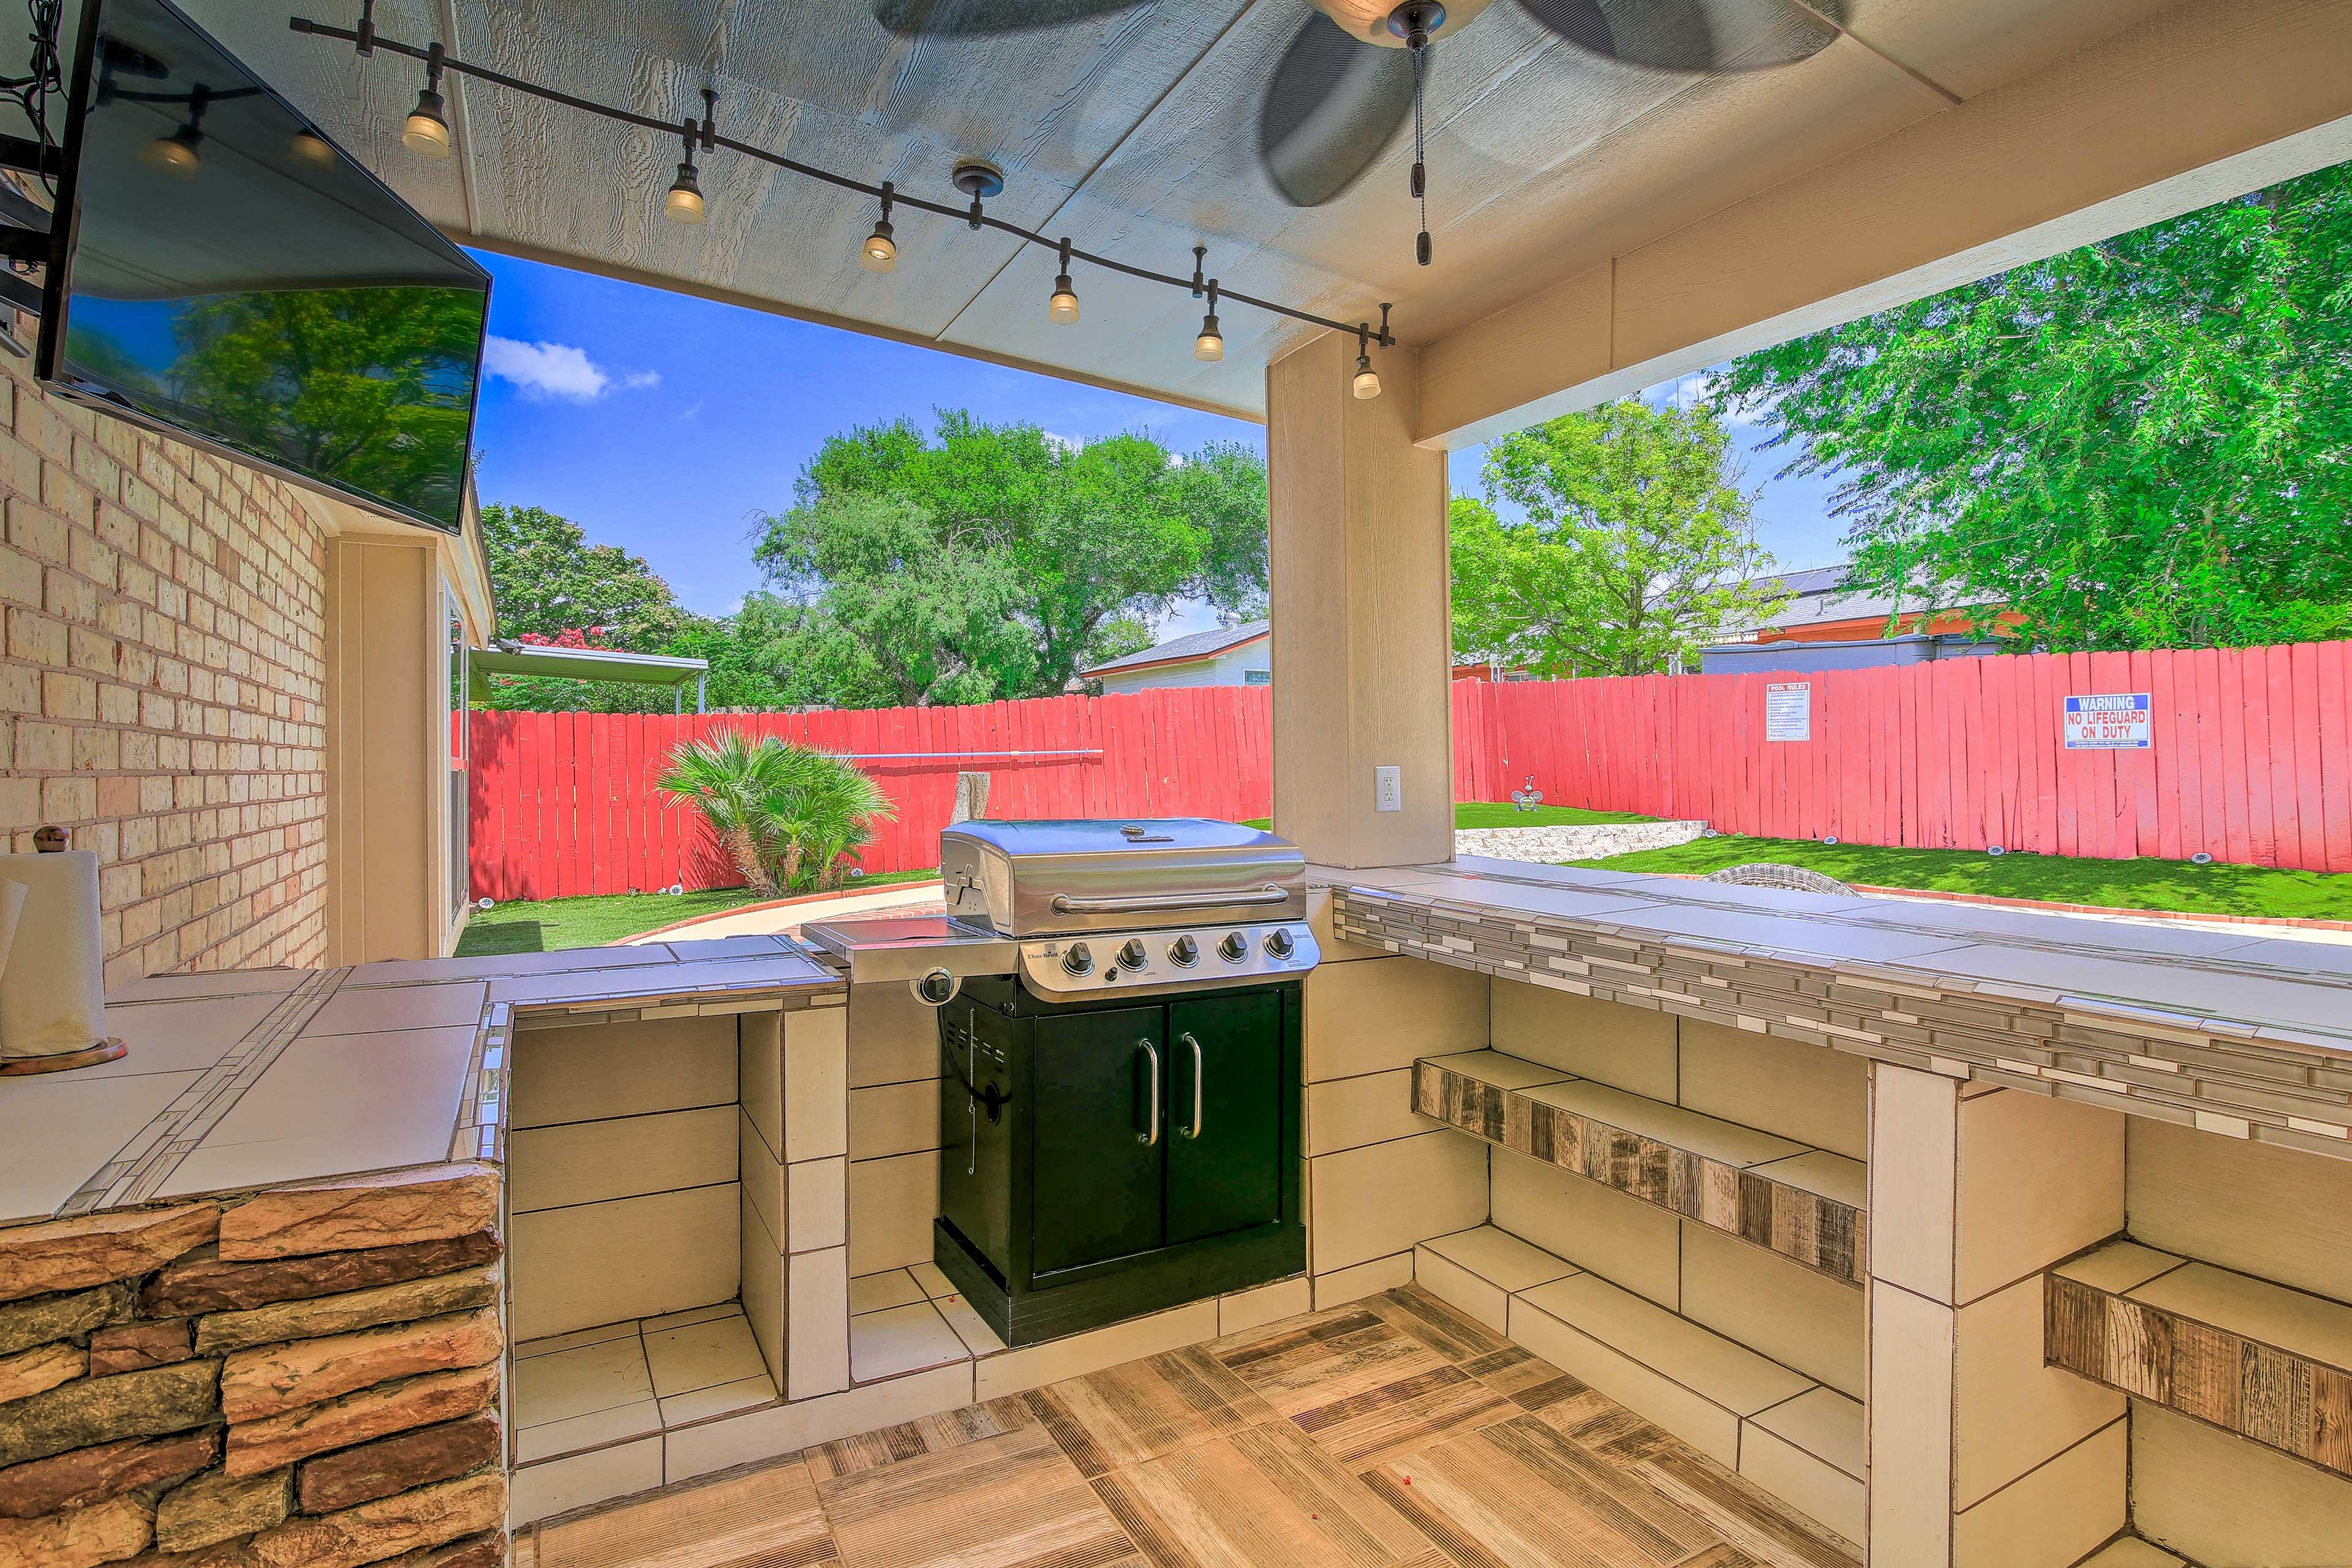 Tasty snacks & poolside margaritas await in this outdoor kitchen.